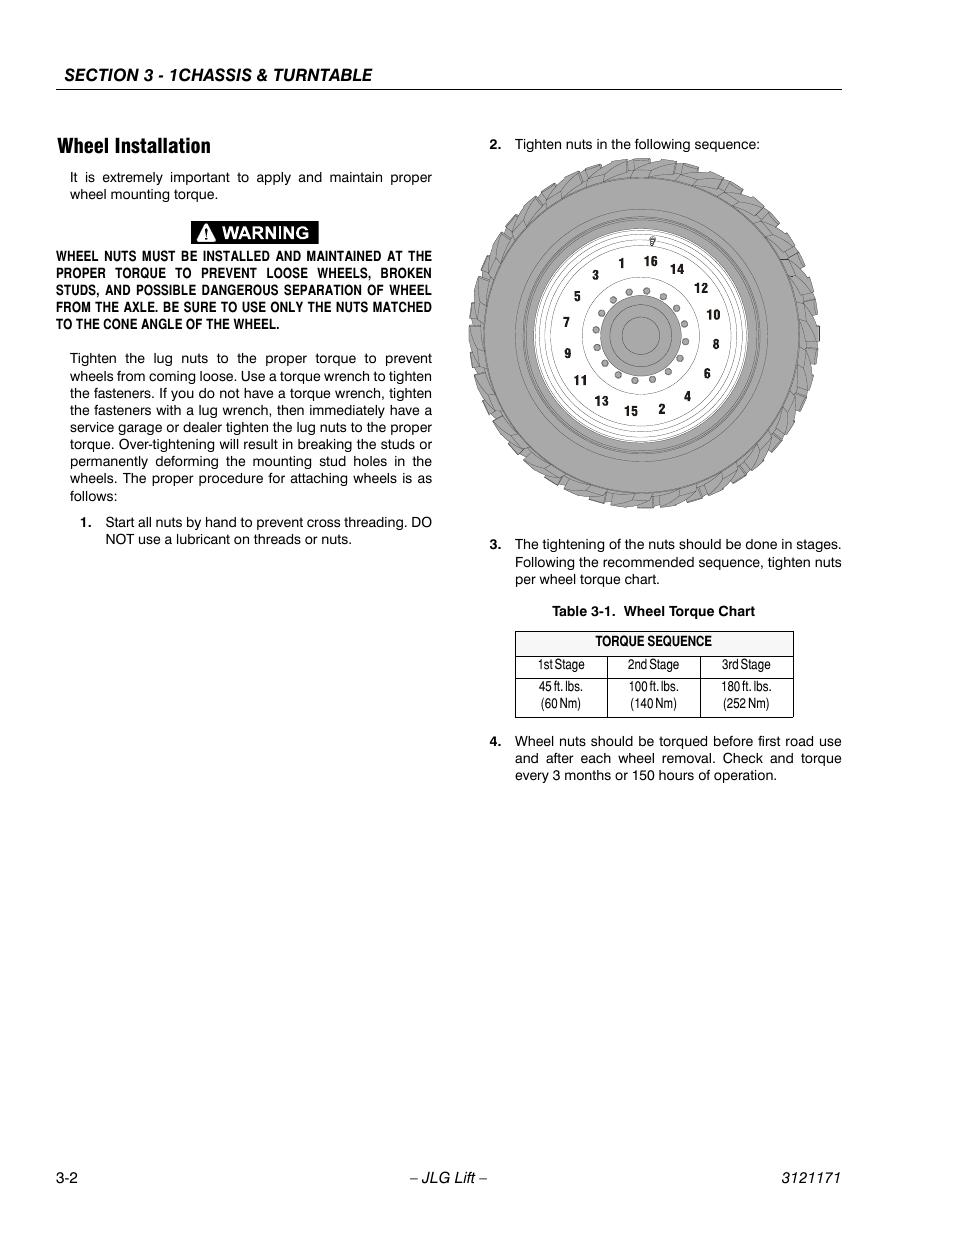 Automotive Wheel Torque Chart | AUTOMOTIVE